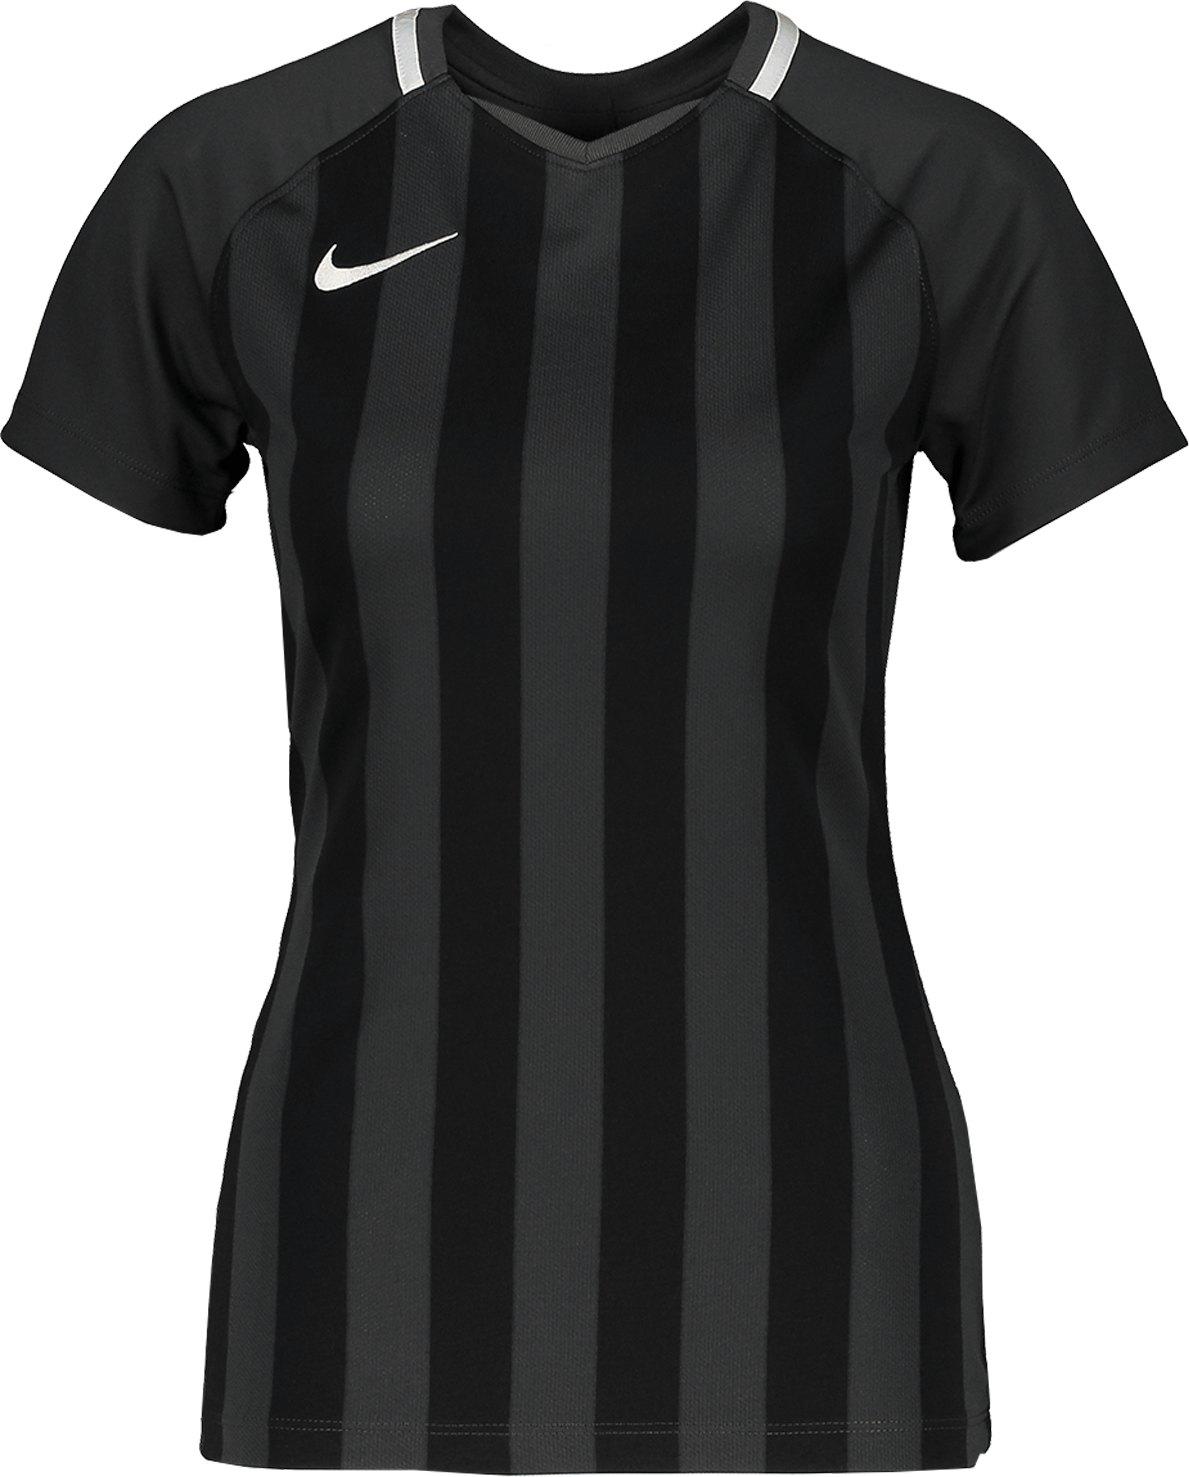 Nike Striped Division III Trikot KA Damen F060 - schwarz